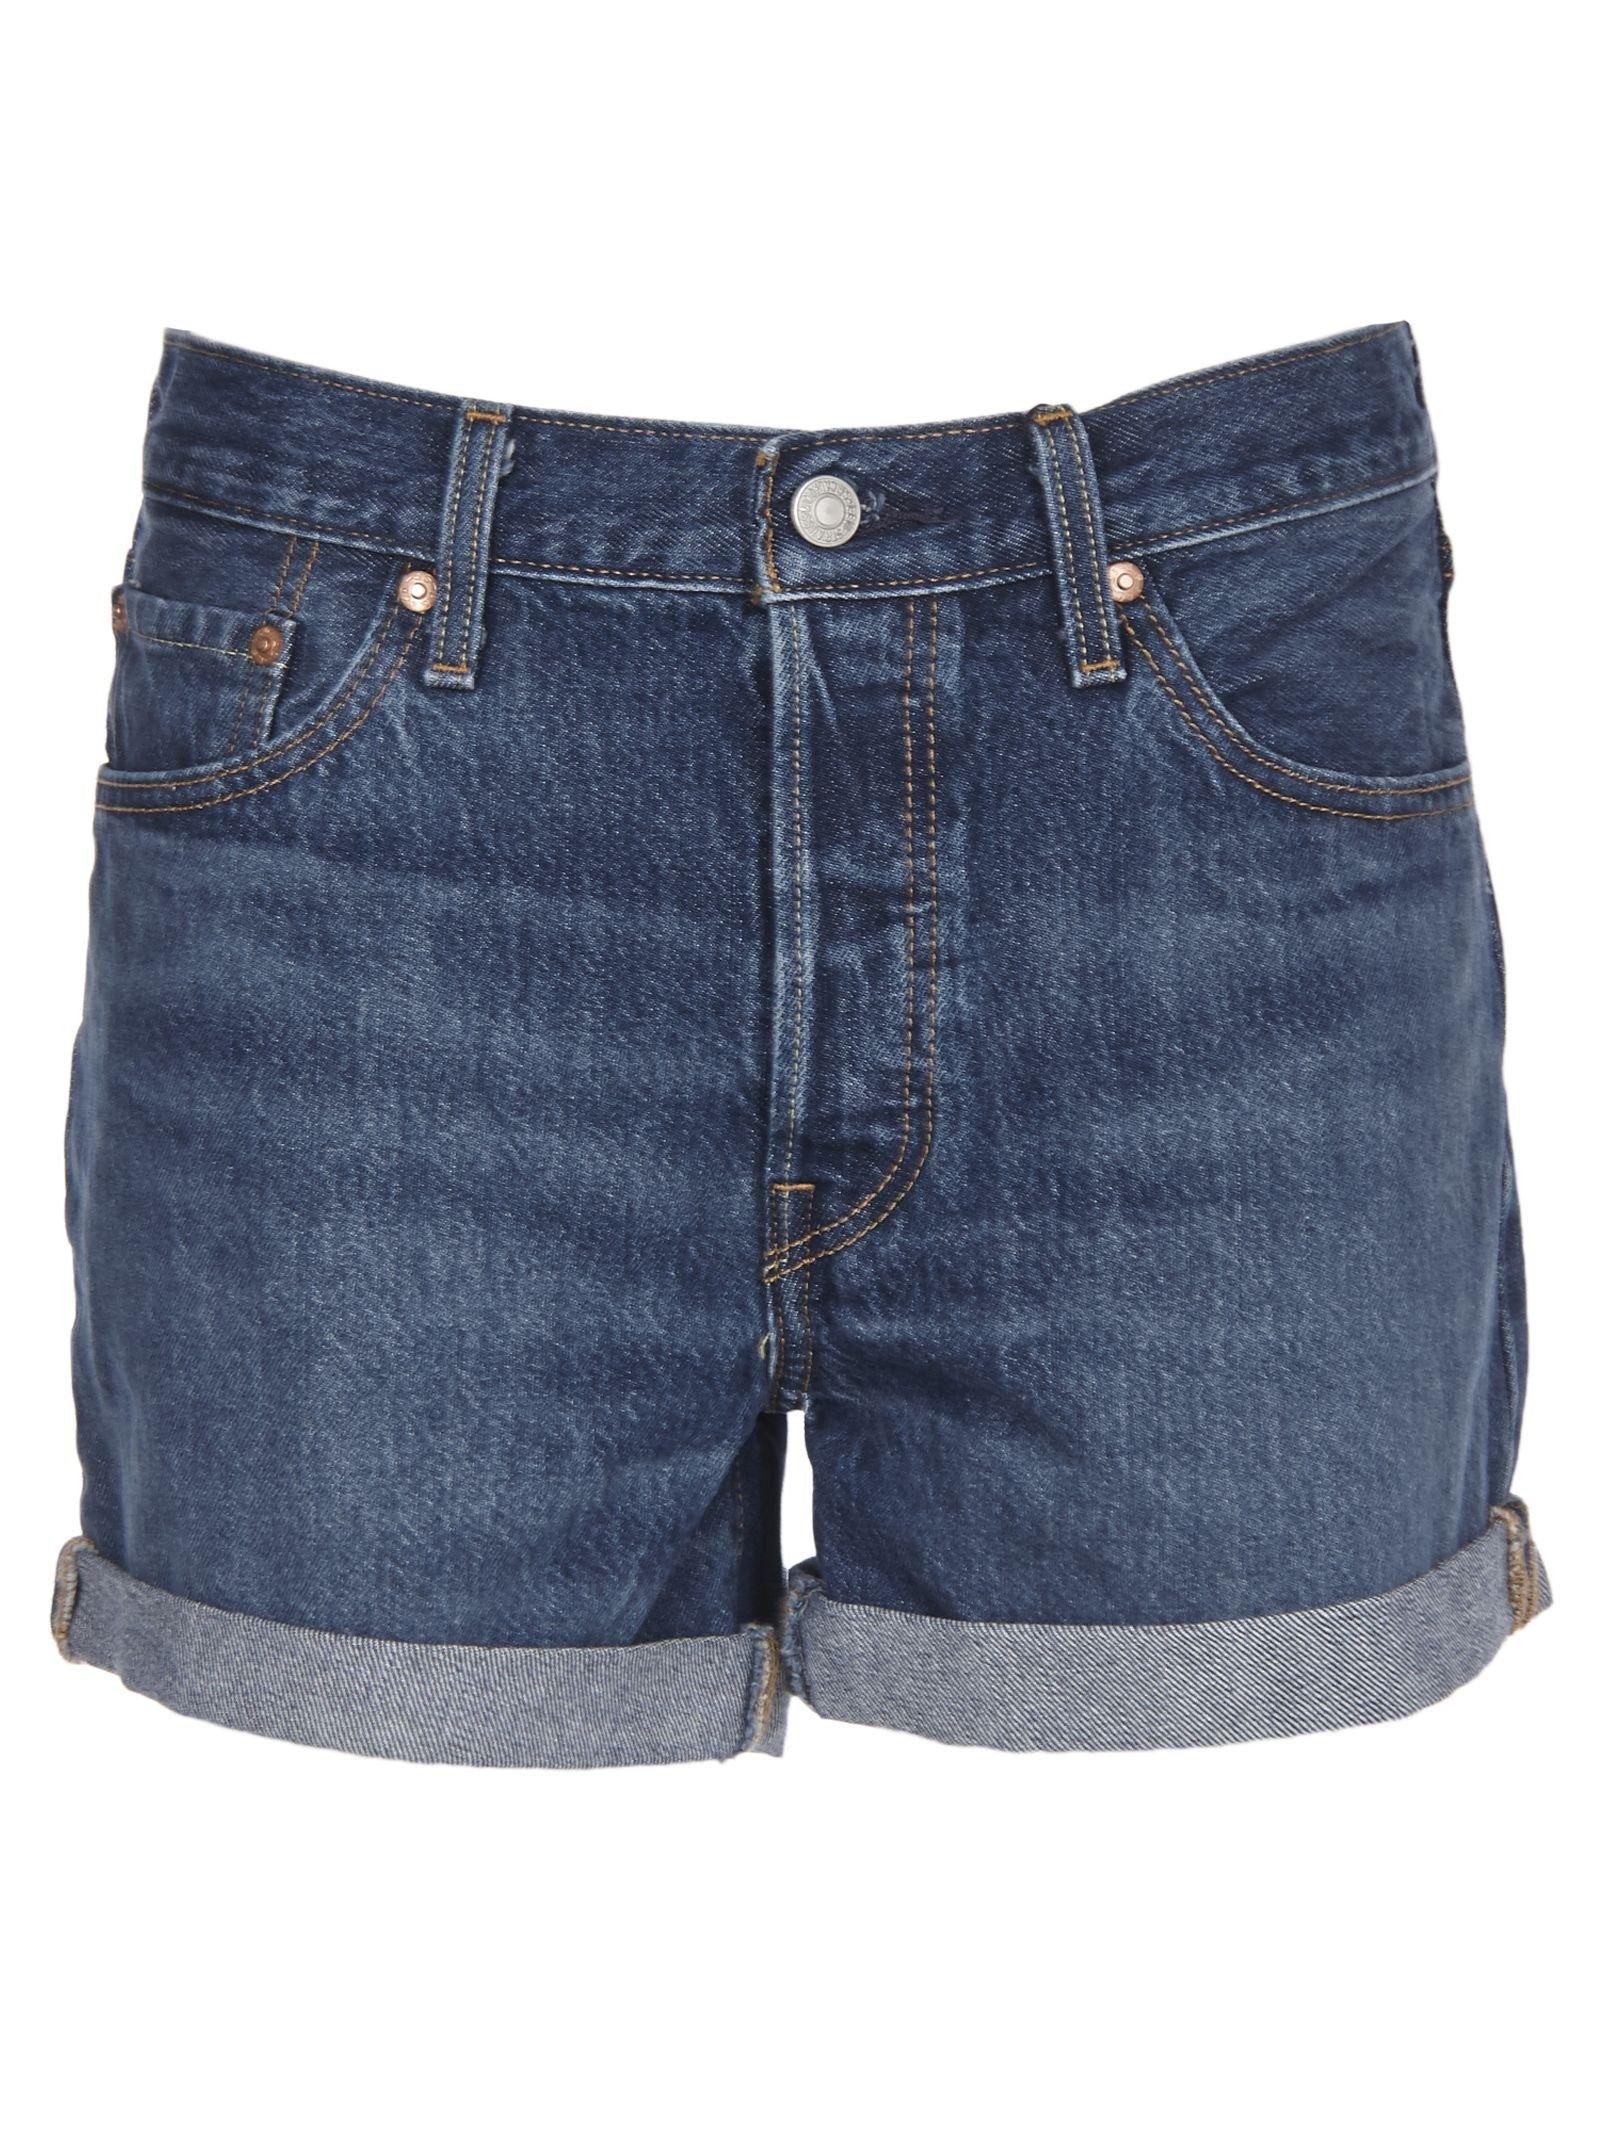 Levis Classic Denim Shorts